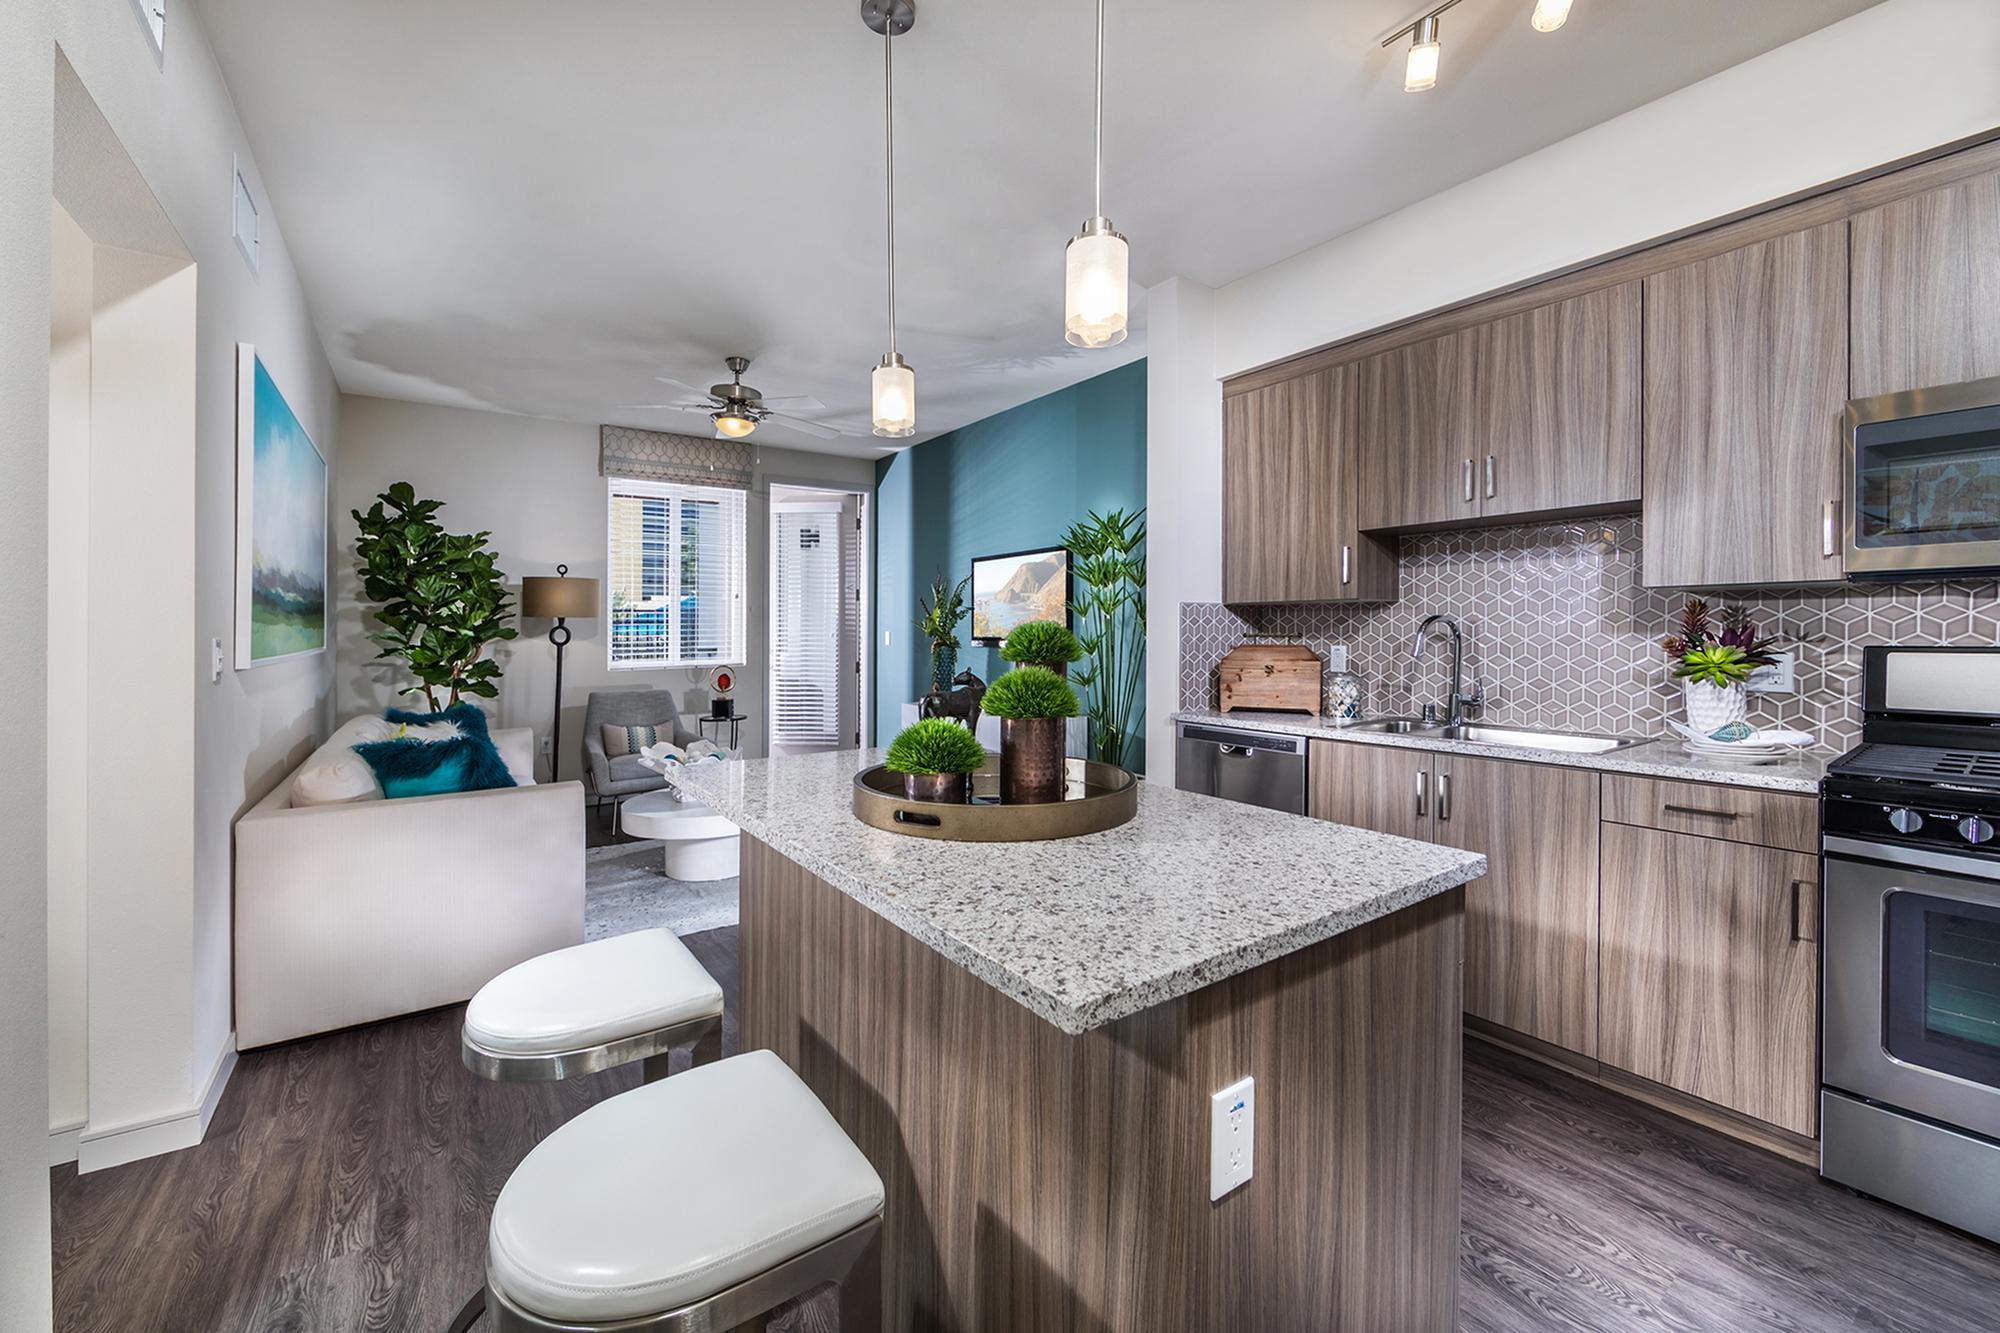 Kitchen island at Areum Apartments in Monrovia CA